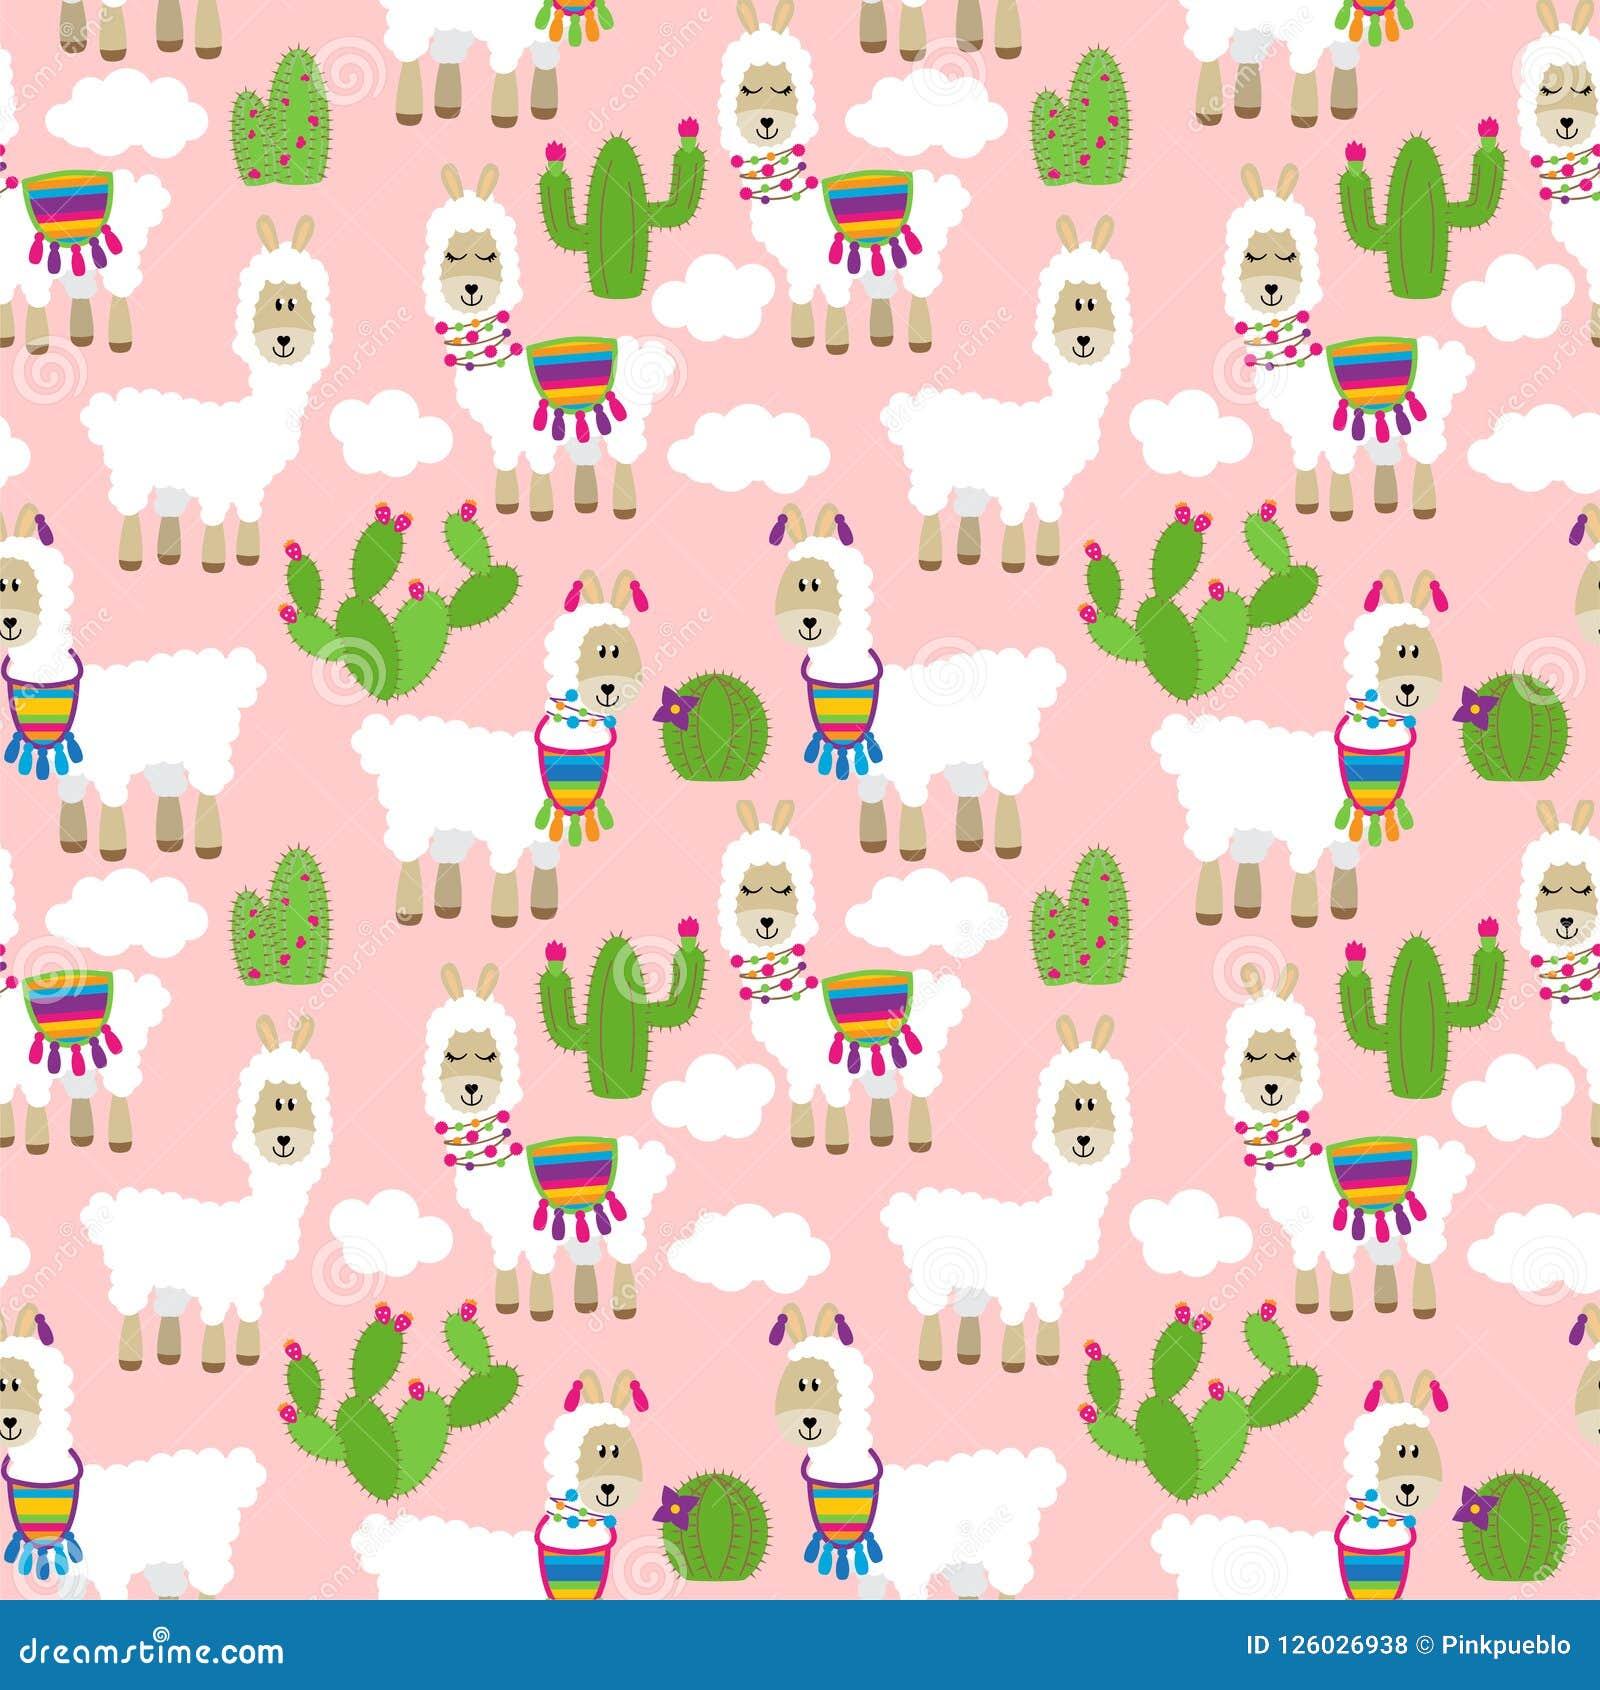 Llama Wallpaper: Seamless, Tileable Llama And Cactus Pattern Stock Vector